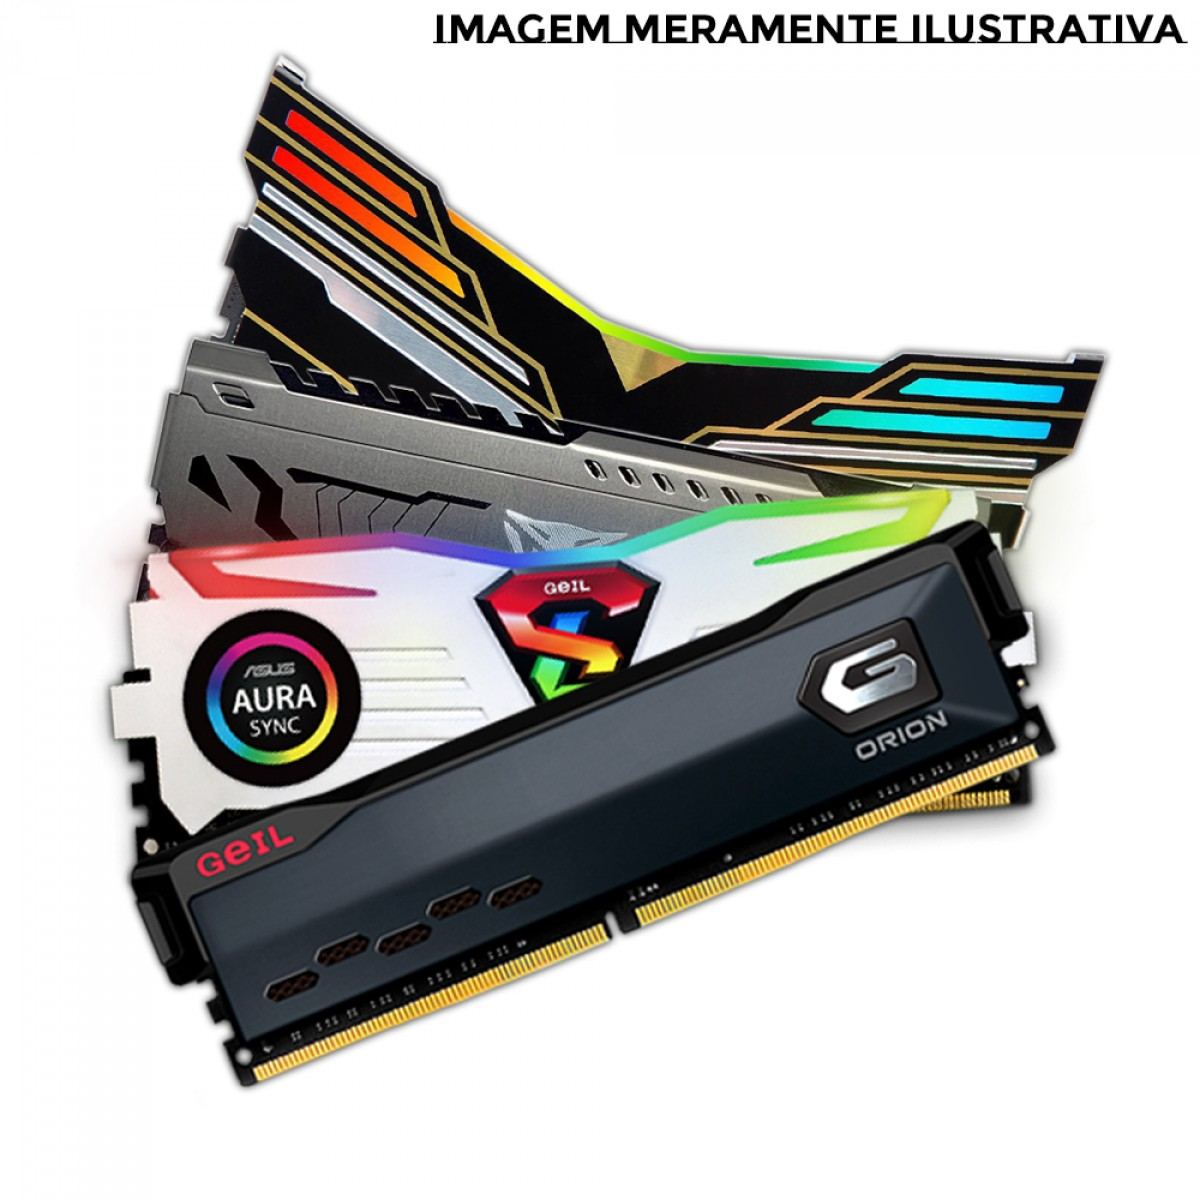 Kit Upgrade, AMD Ryzen 3 PRO 4350G, Asus TUF GAMING B450M-PLUS II, Memória DDR4 8GB 3000MHz